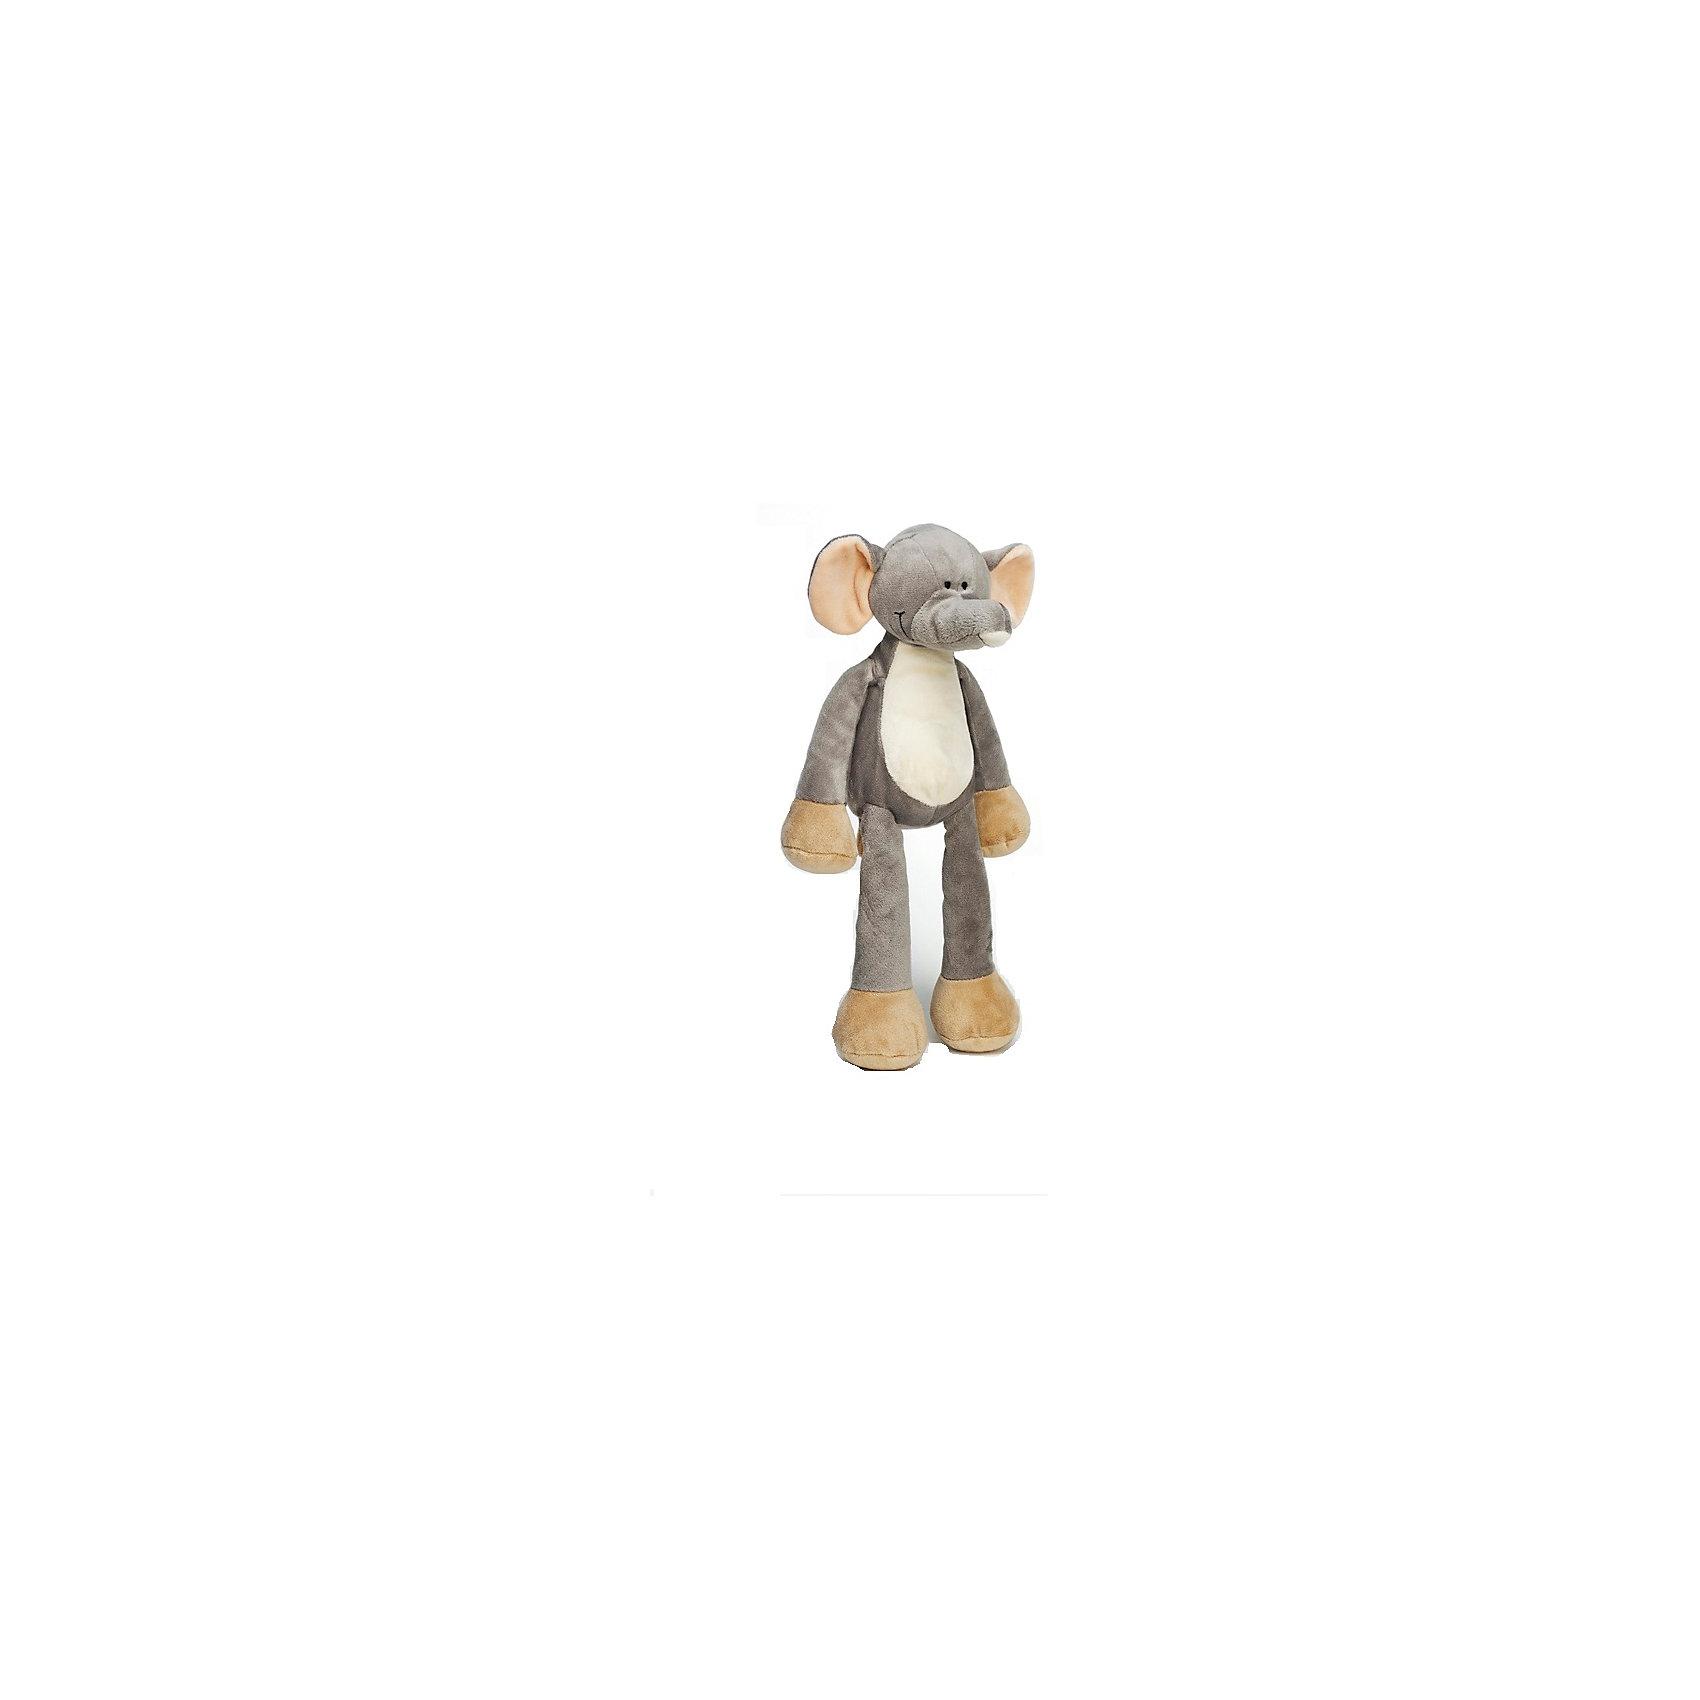 Мягкая игрушка Слон, Динглисар, Teddykompaniet